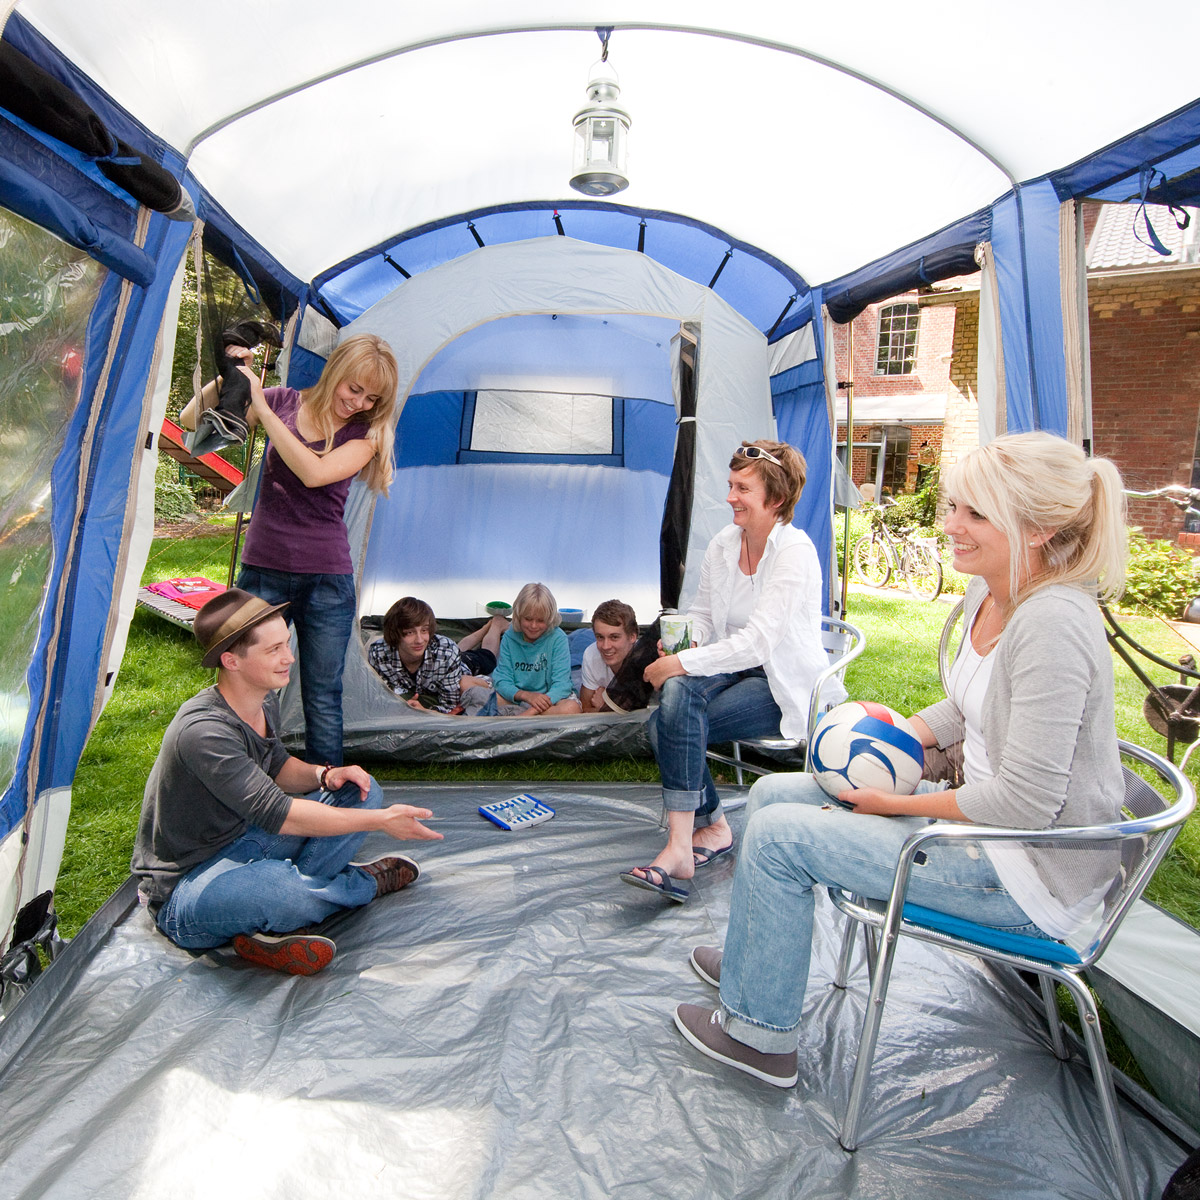 skandika montana 6 familienzelt outdoor zelt 6 personen uvp 449 2014 neu ebay. Black Bedroom Furniture Sets. Home Design Ideas